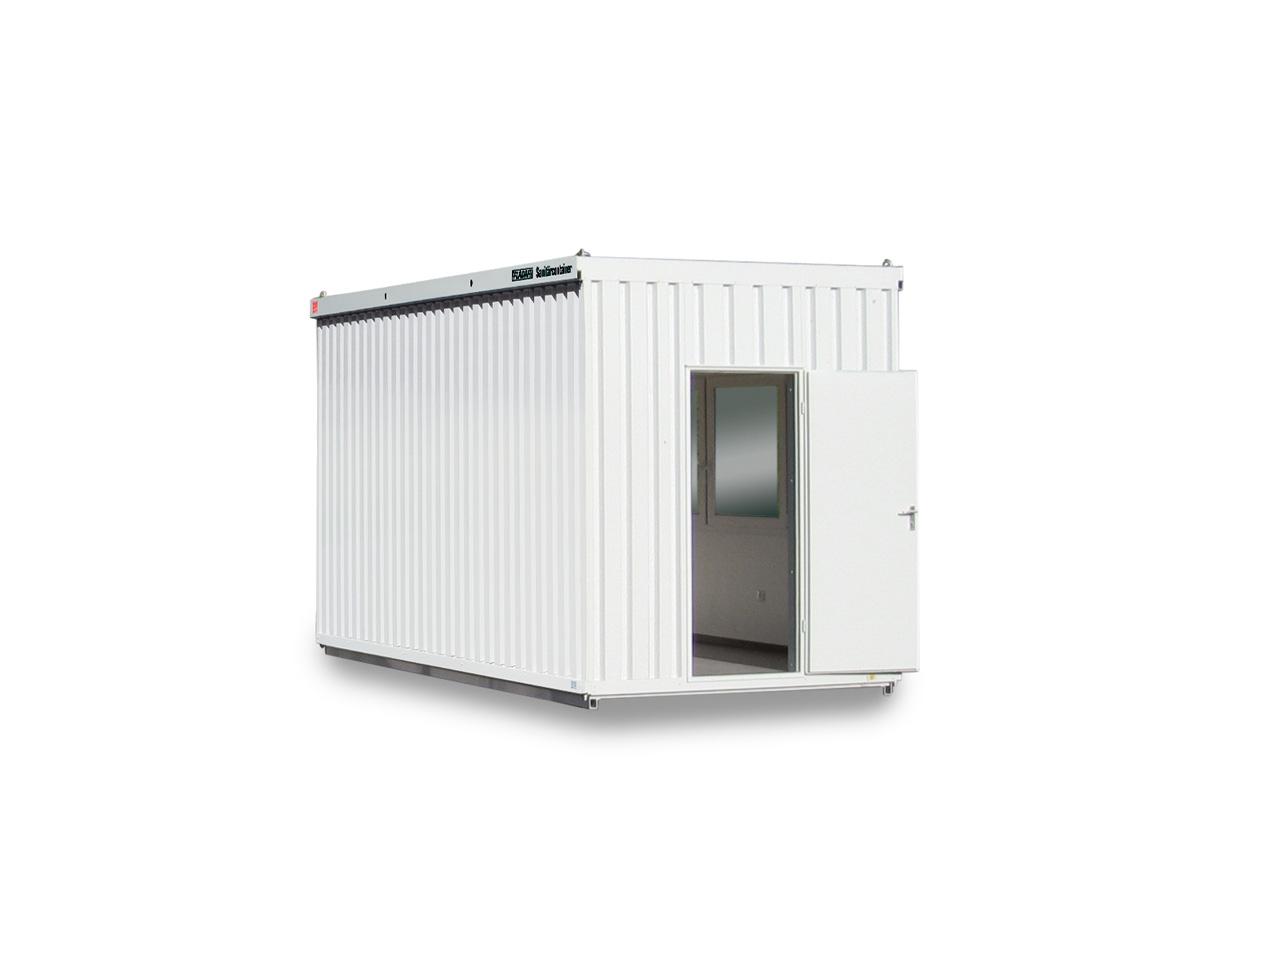 fladafi containerbau sc 6853 6 m container kaufen. Black Bedroom Furniture Sets. Home Design Ideas